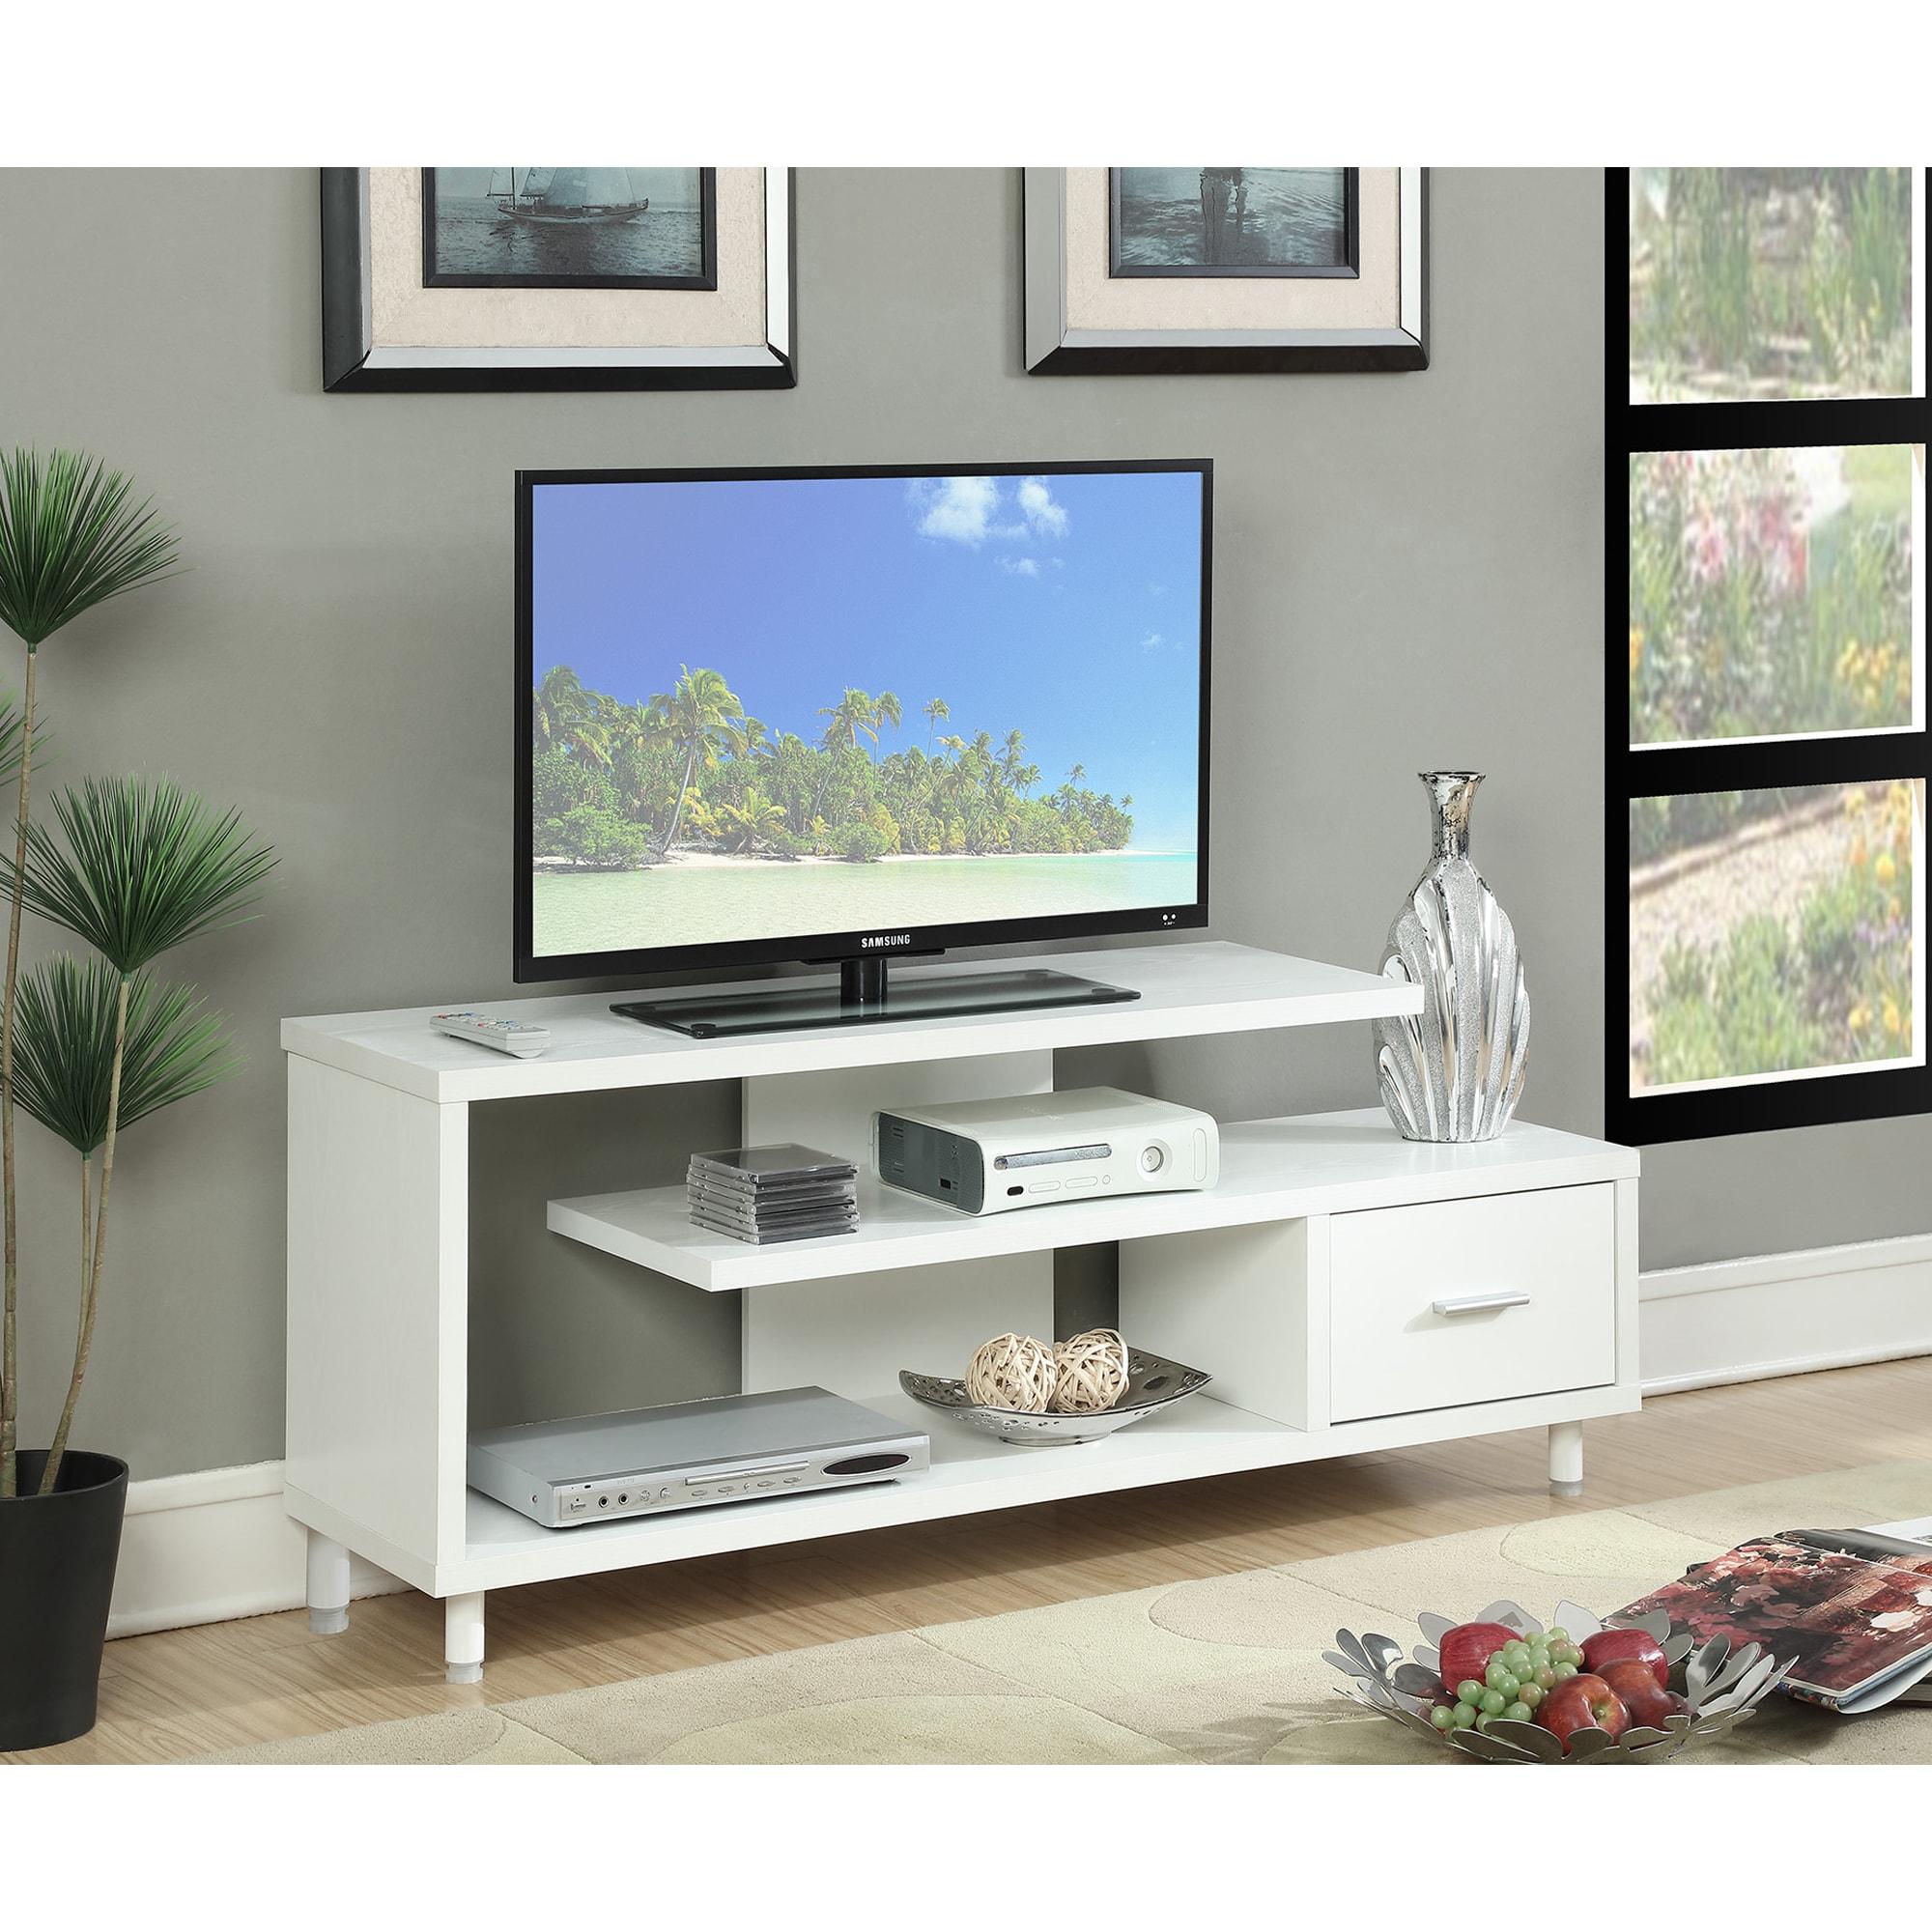 Shop Porch Den Logan Seal 60 Inch Tv Stand On Sale Free